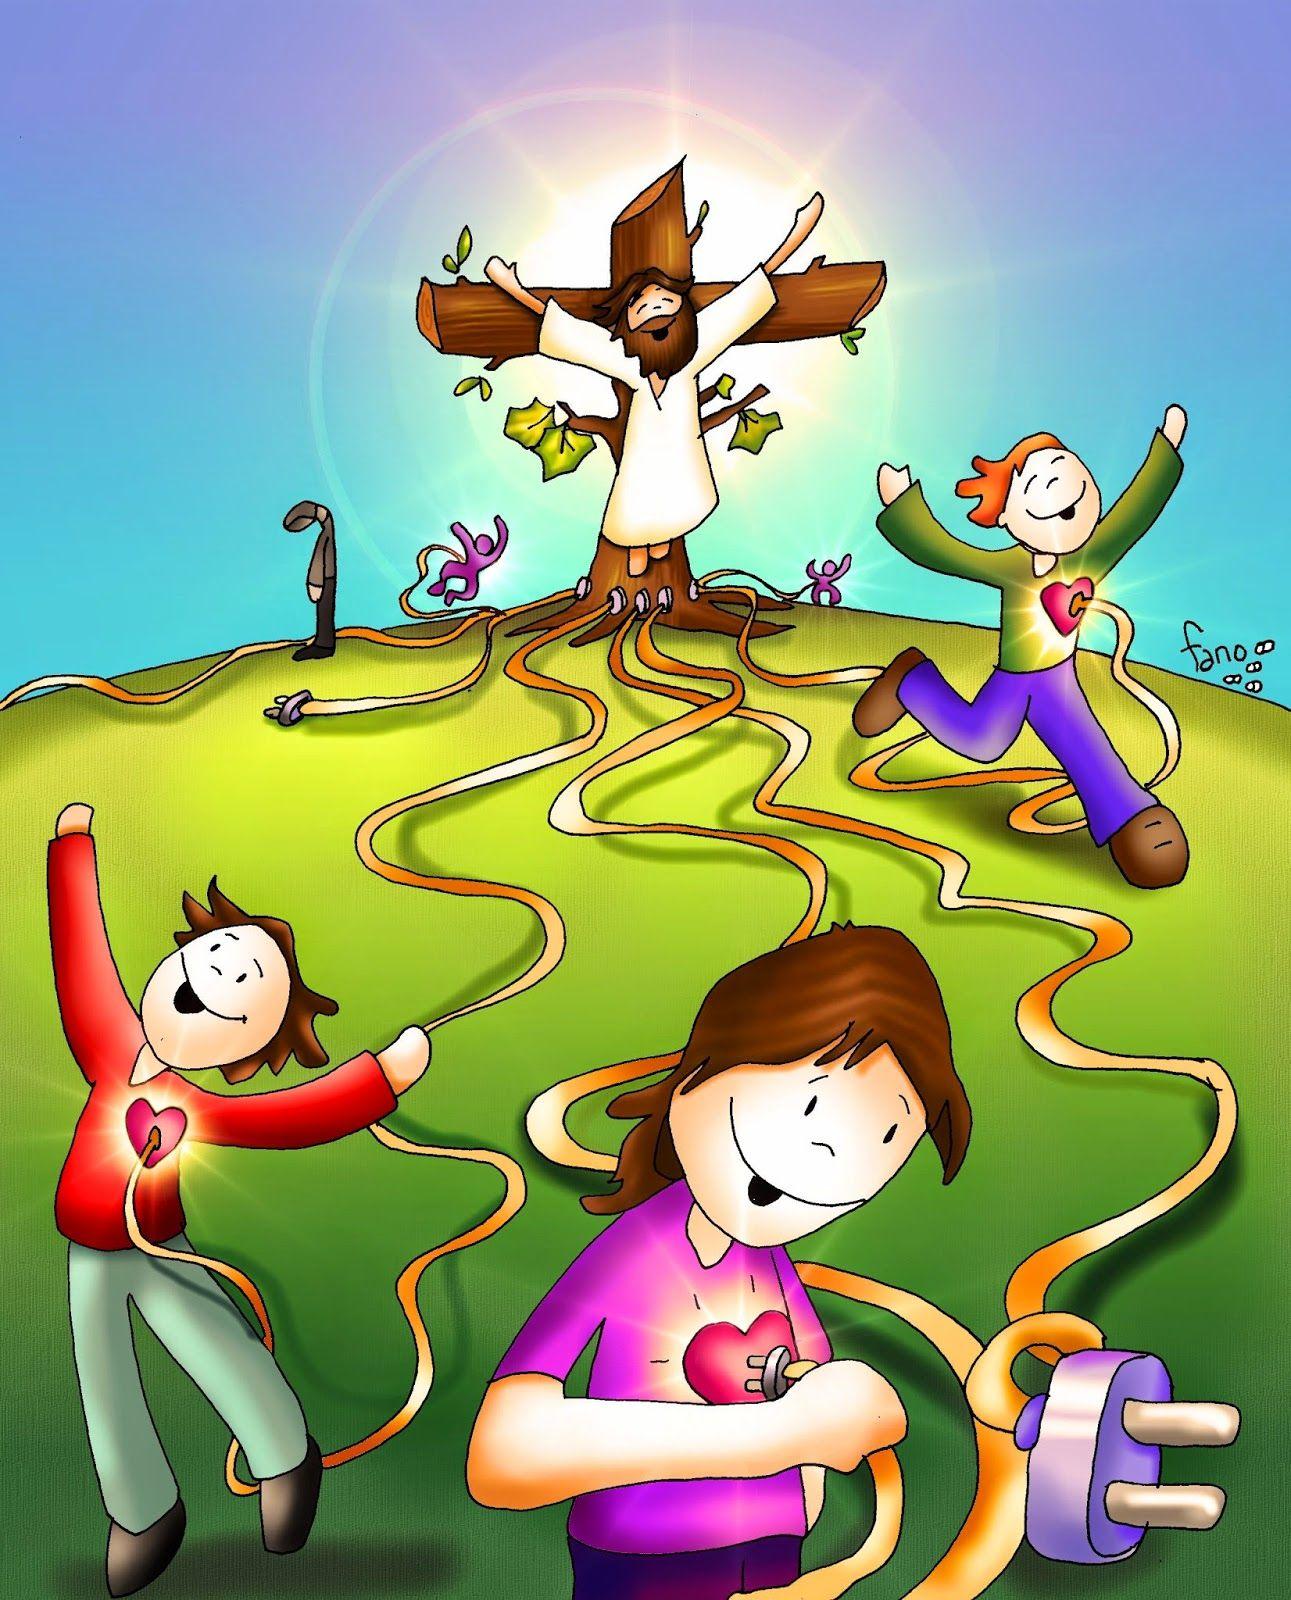 Catequesi Familiar   Historias de la biblia para niños, Catequesis ...